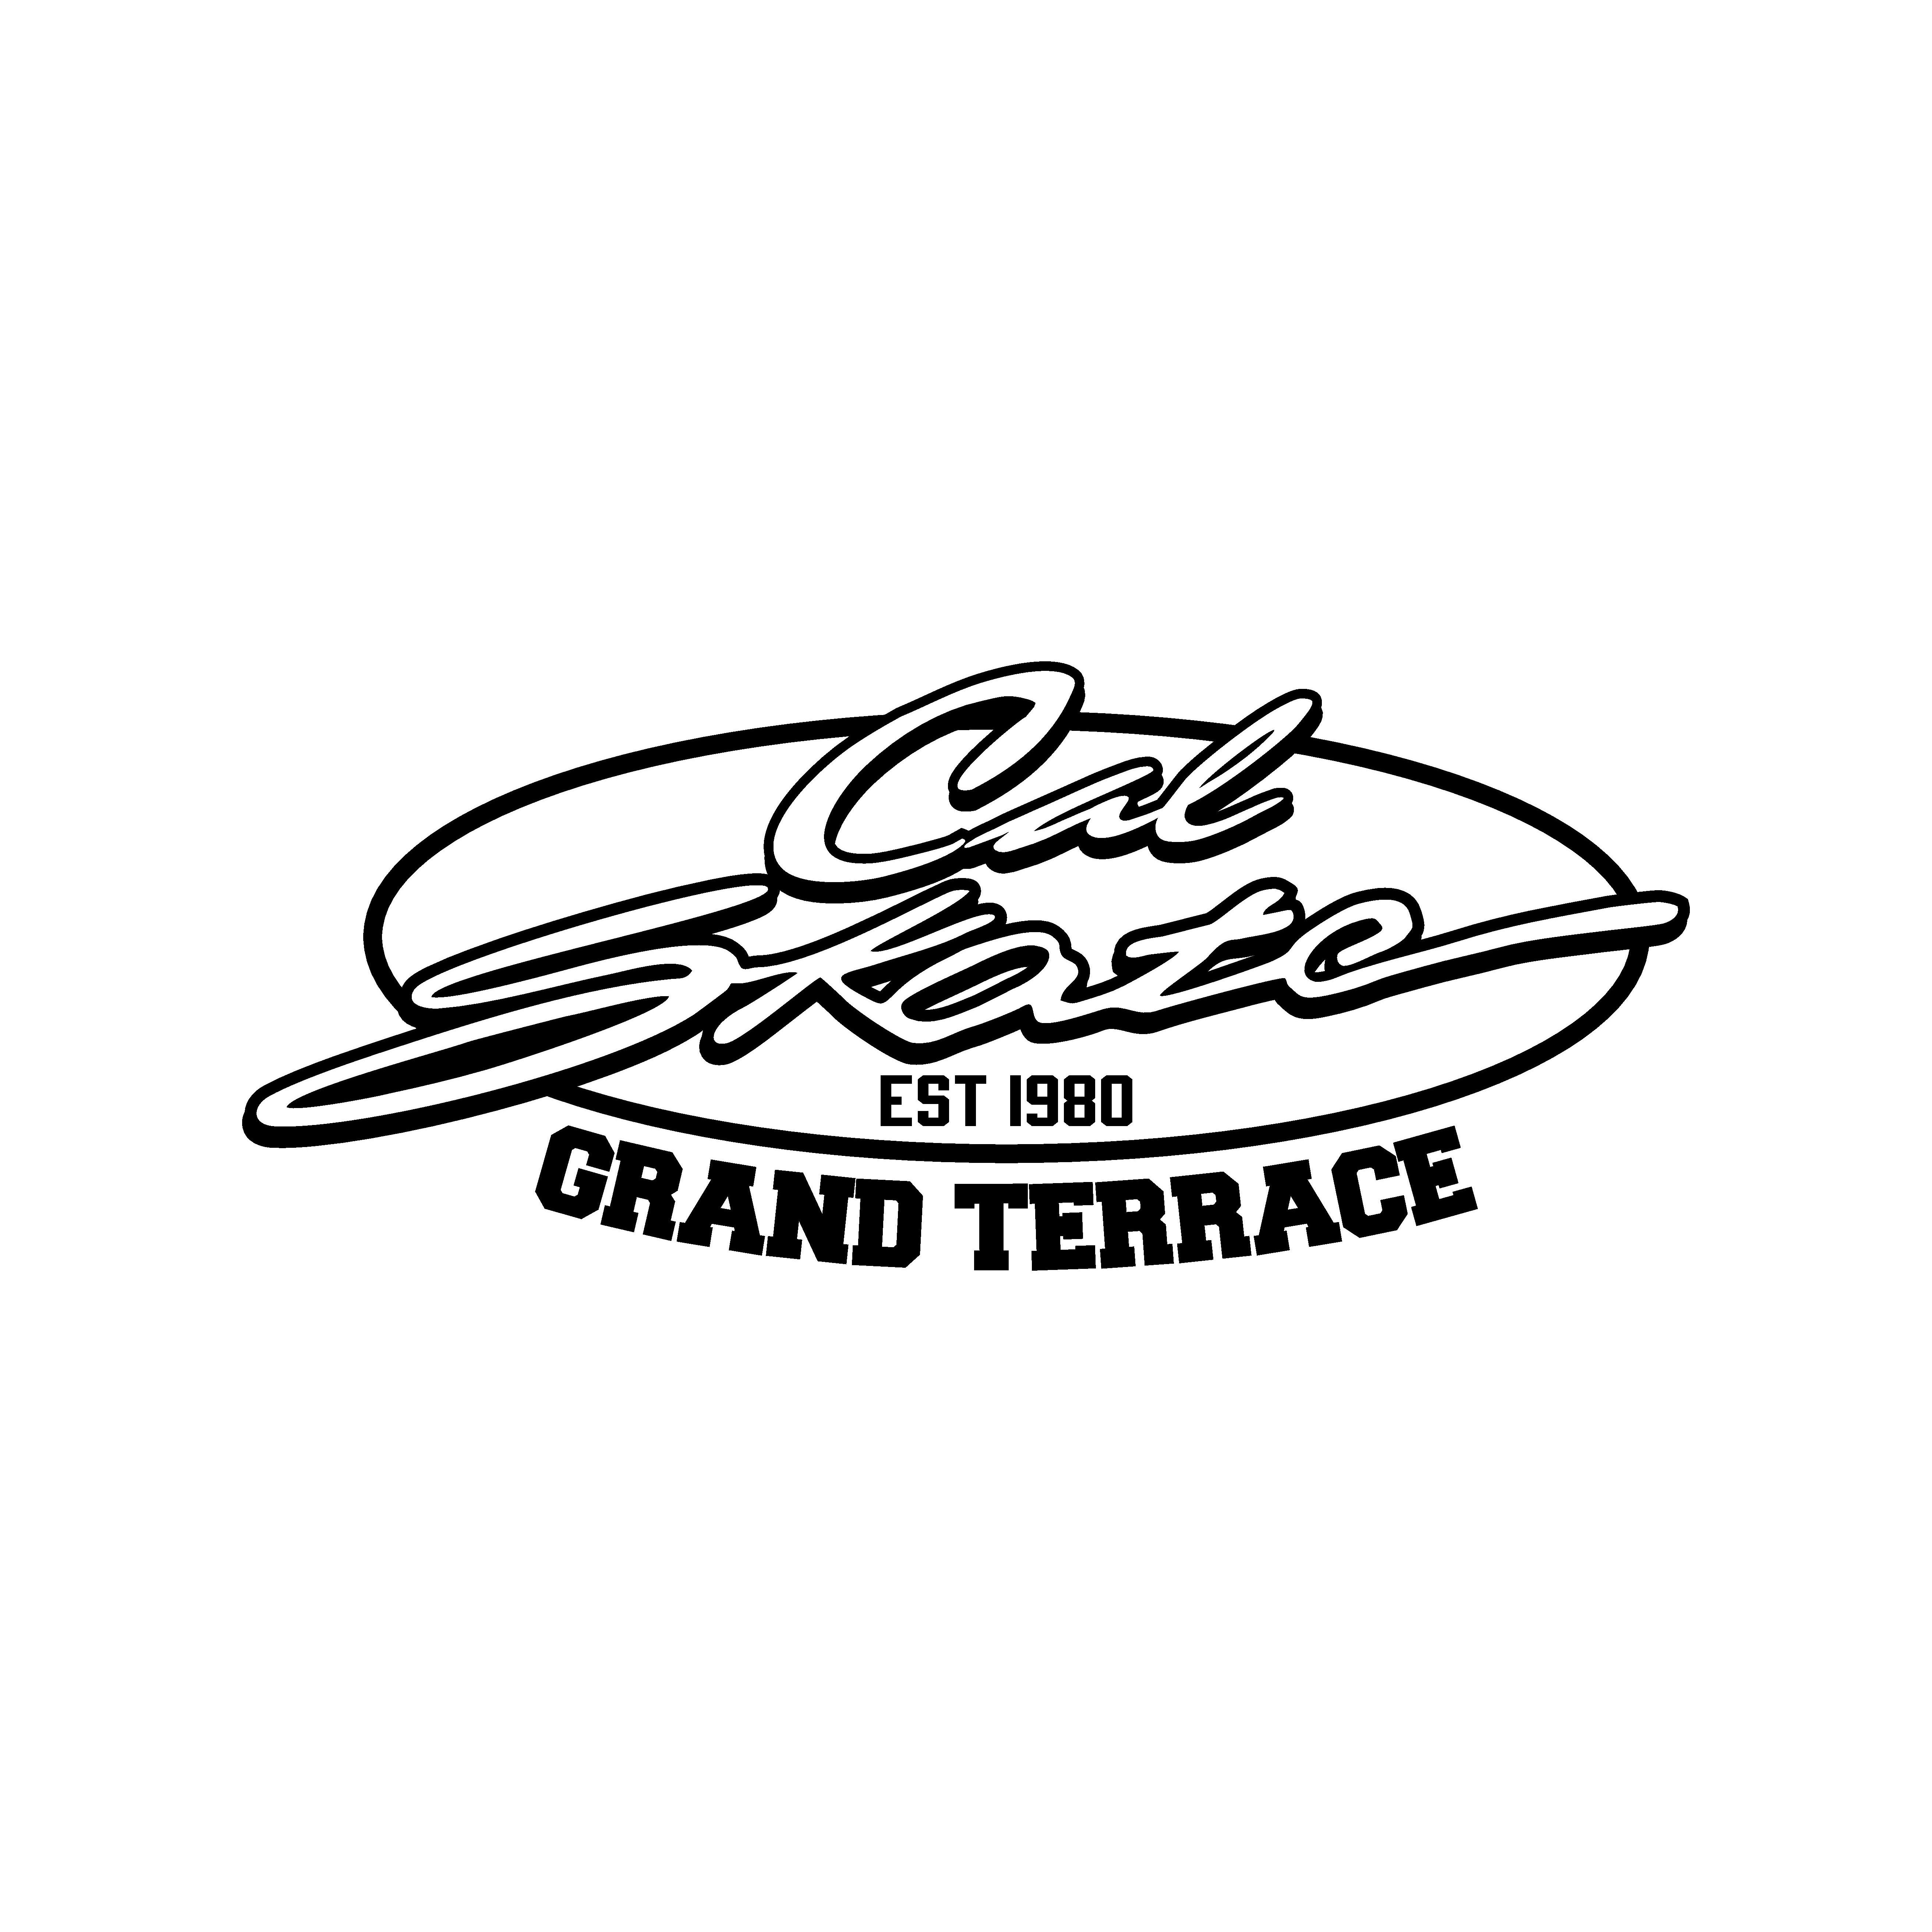 Cal skate grand terrace in grand terrace ca 92313 for 22080 commerce way grand terrace ca